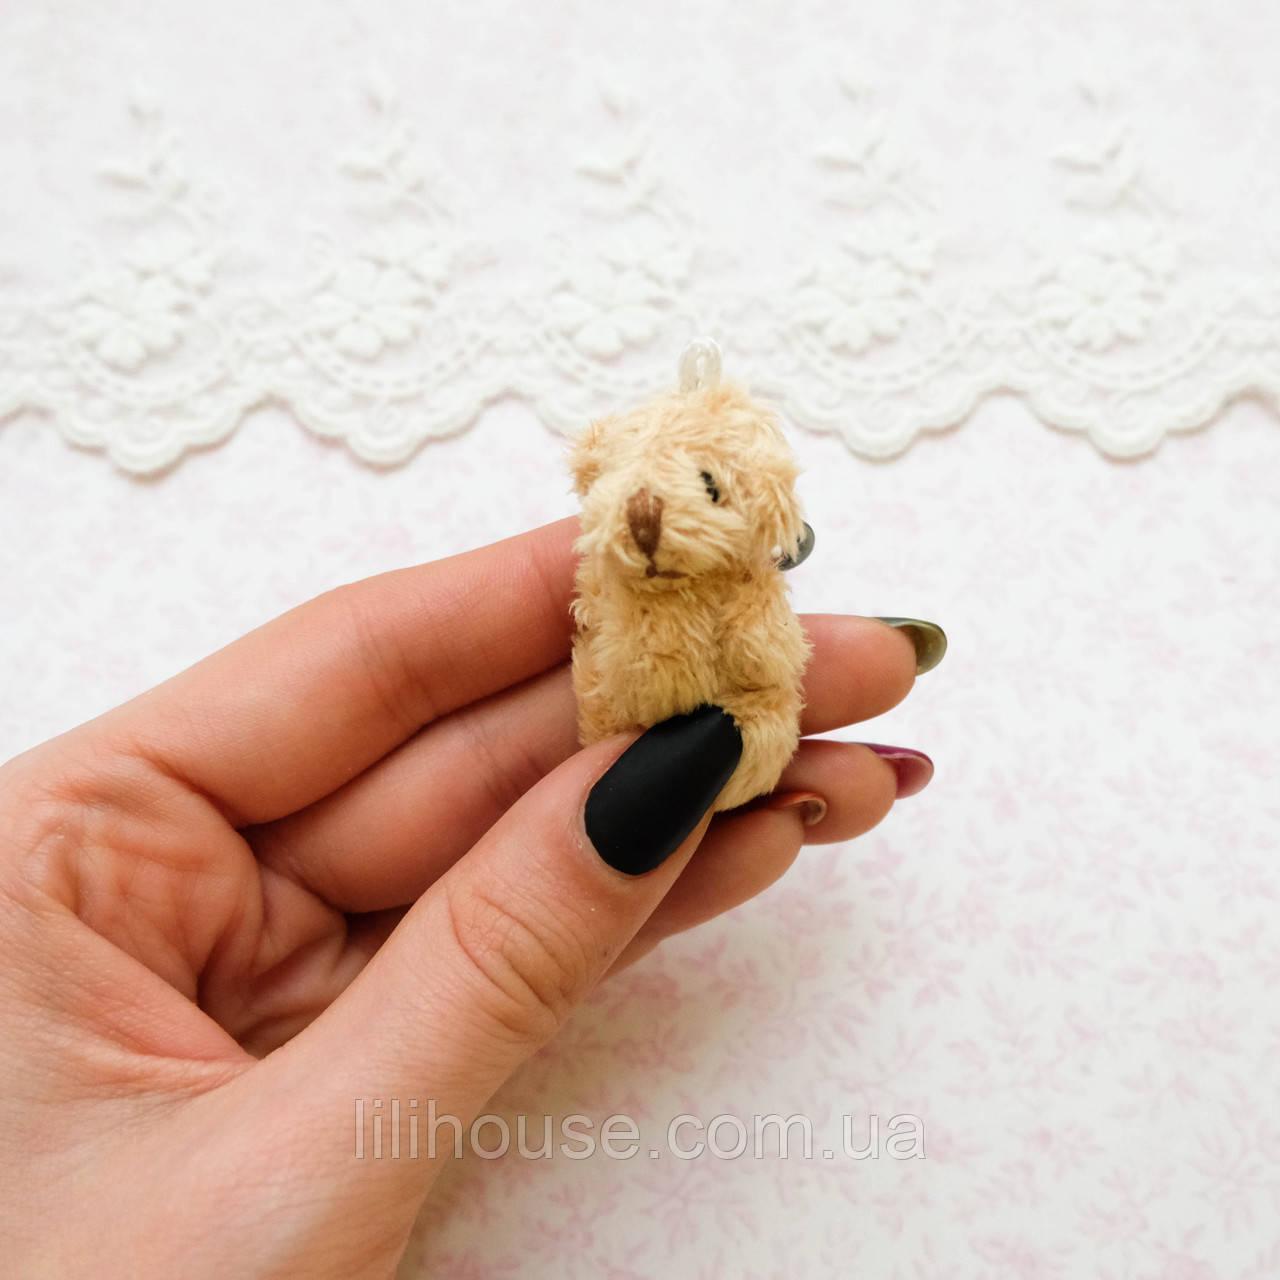 Мягкая Игрушка Медвежонок 4.5 см ЛАТТЕ